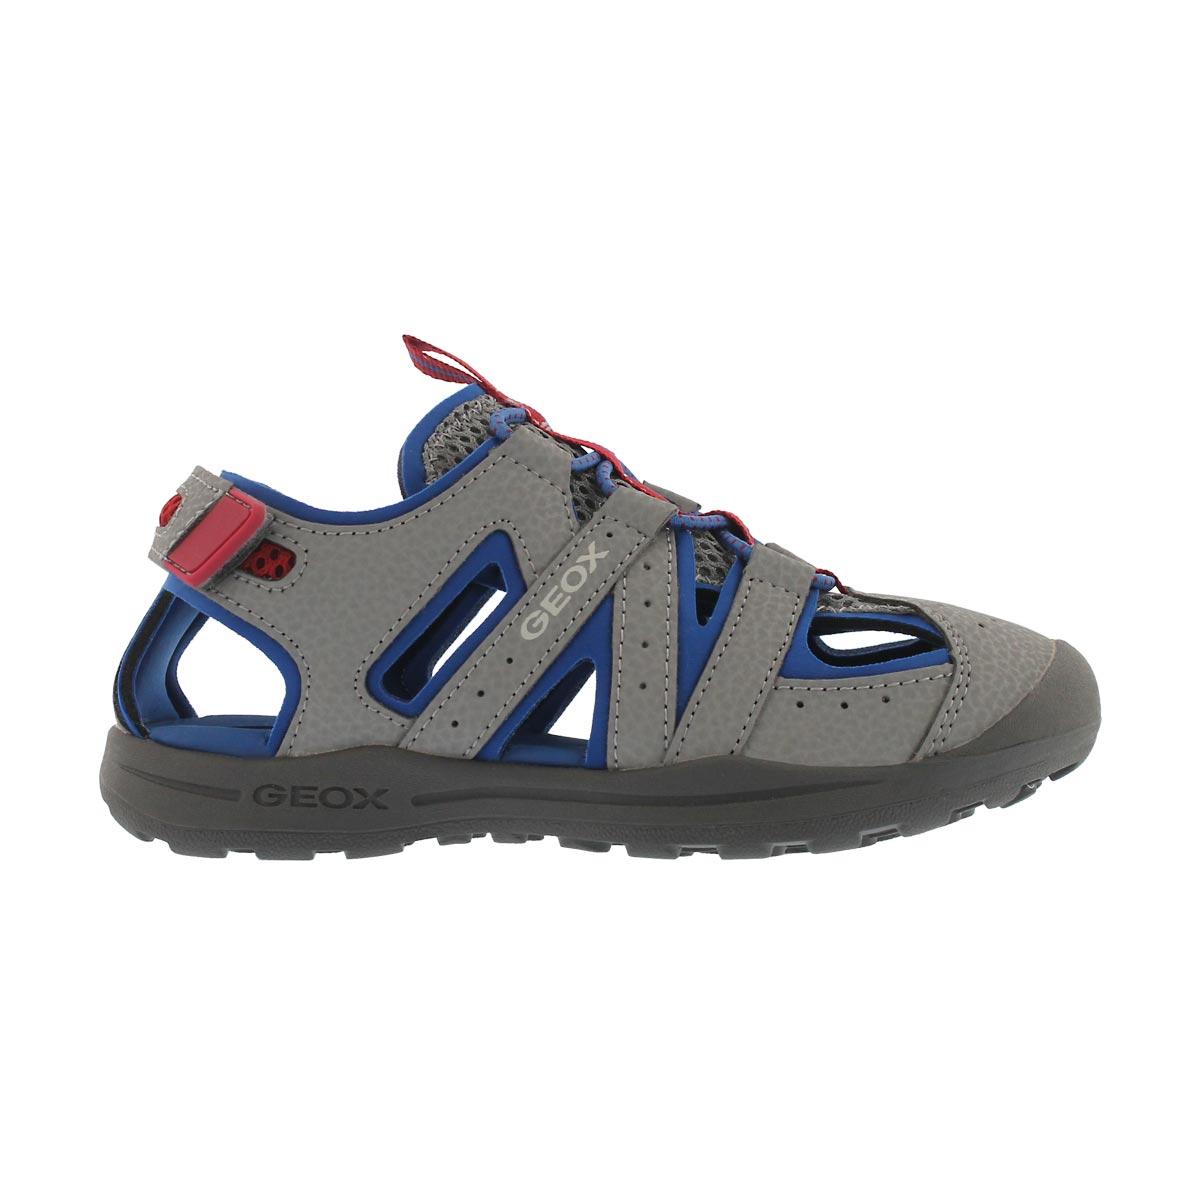 Bys J Vaniett gry/ryl fisherman sandal